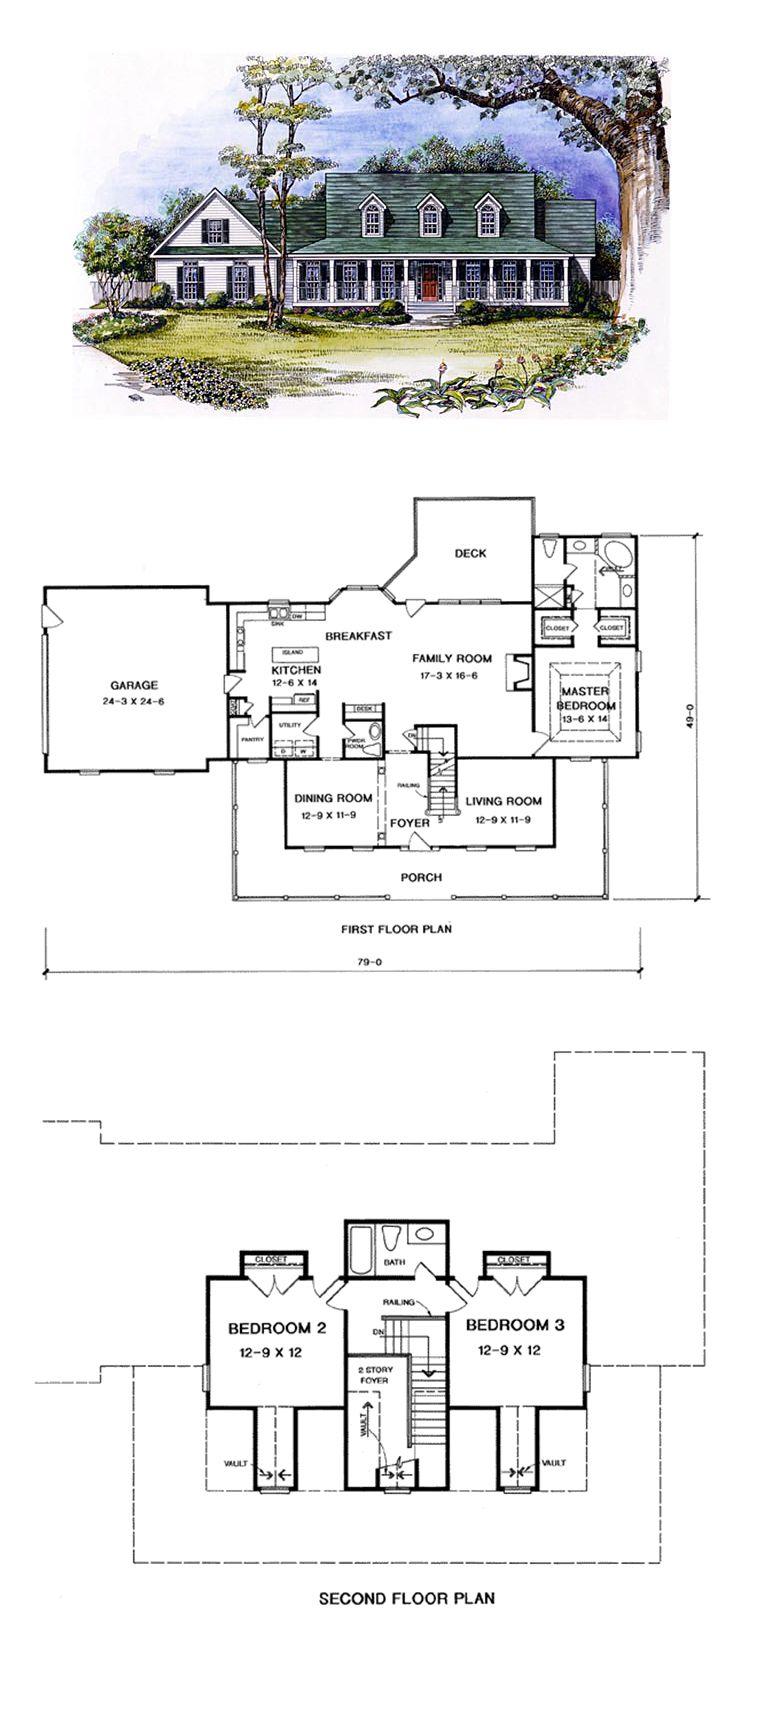 Cape Cod Style House Plan 58207 With 3 Bed 3 Bath 2 Car Garage Cape Cod House Plans Building Plans House Cape Cod House